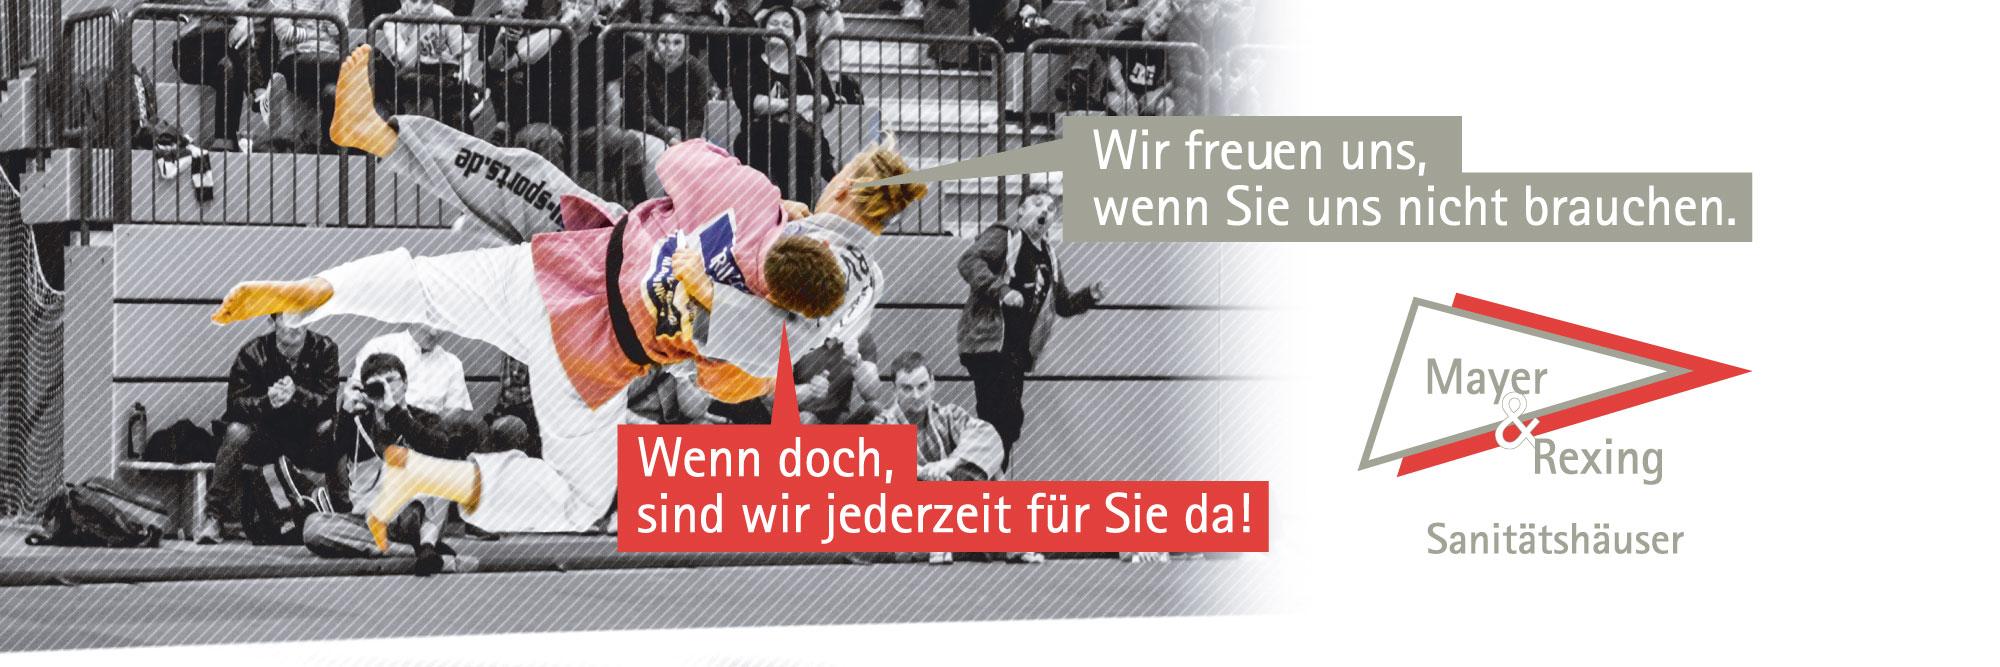 Mayer+Rexing Judo Rhein-Neckar